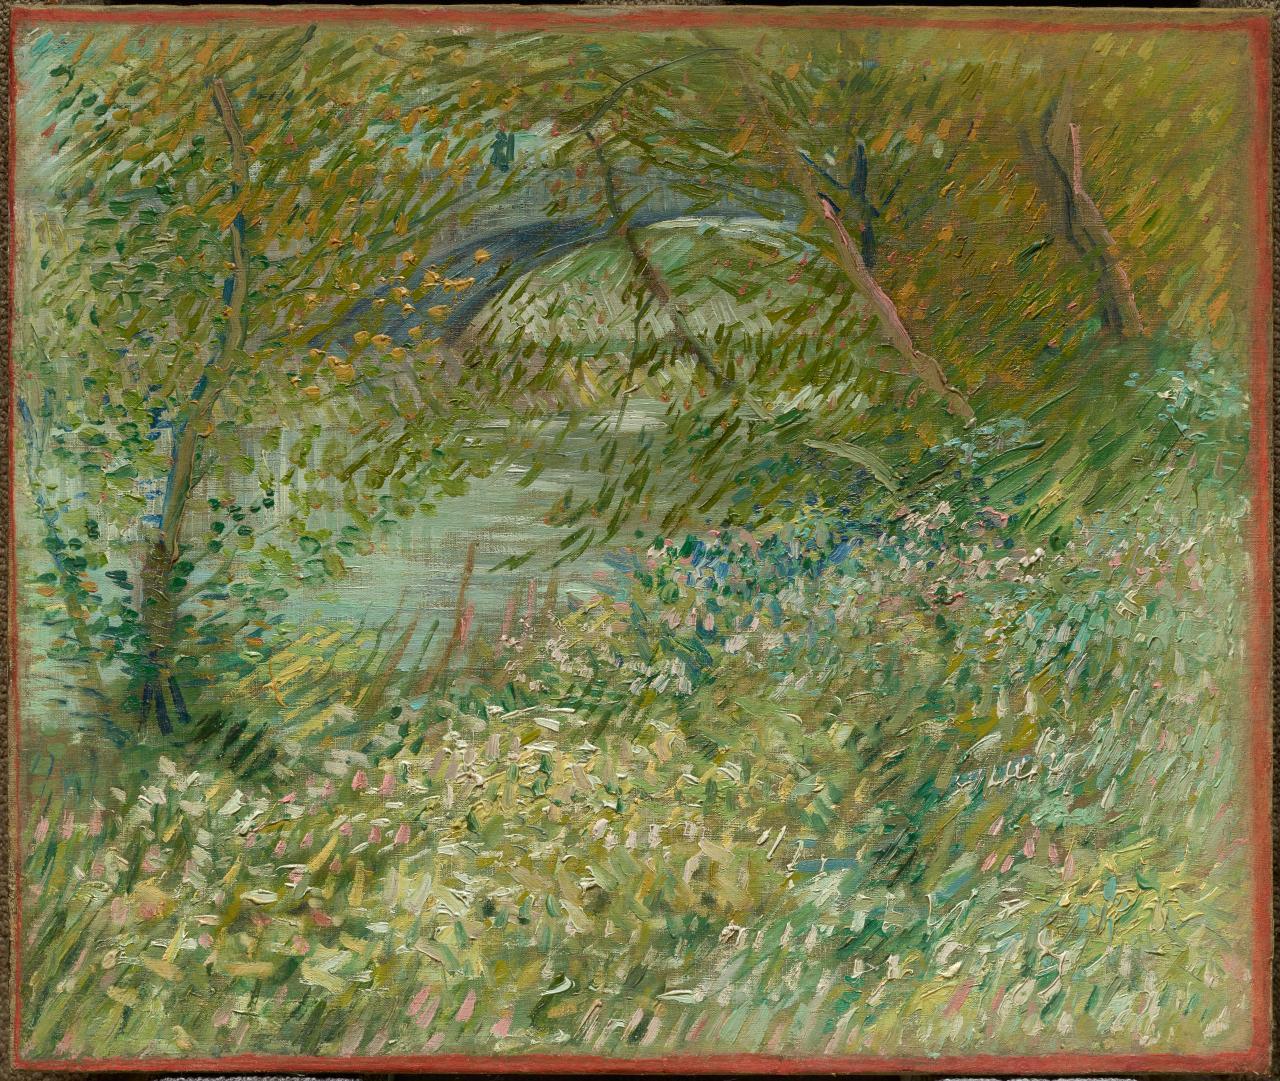 Neo Impressionism Artists: Van Gogh And The Seasons